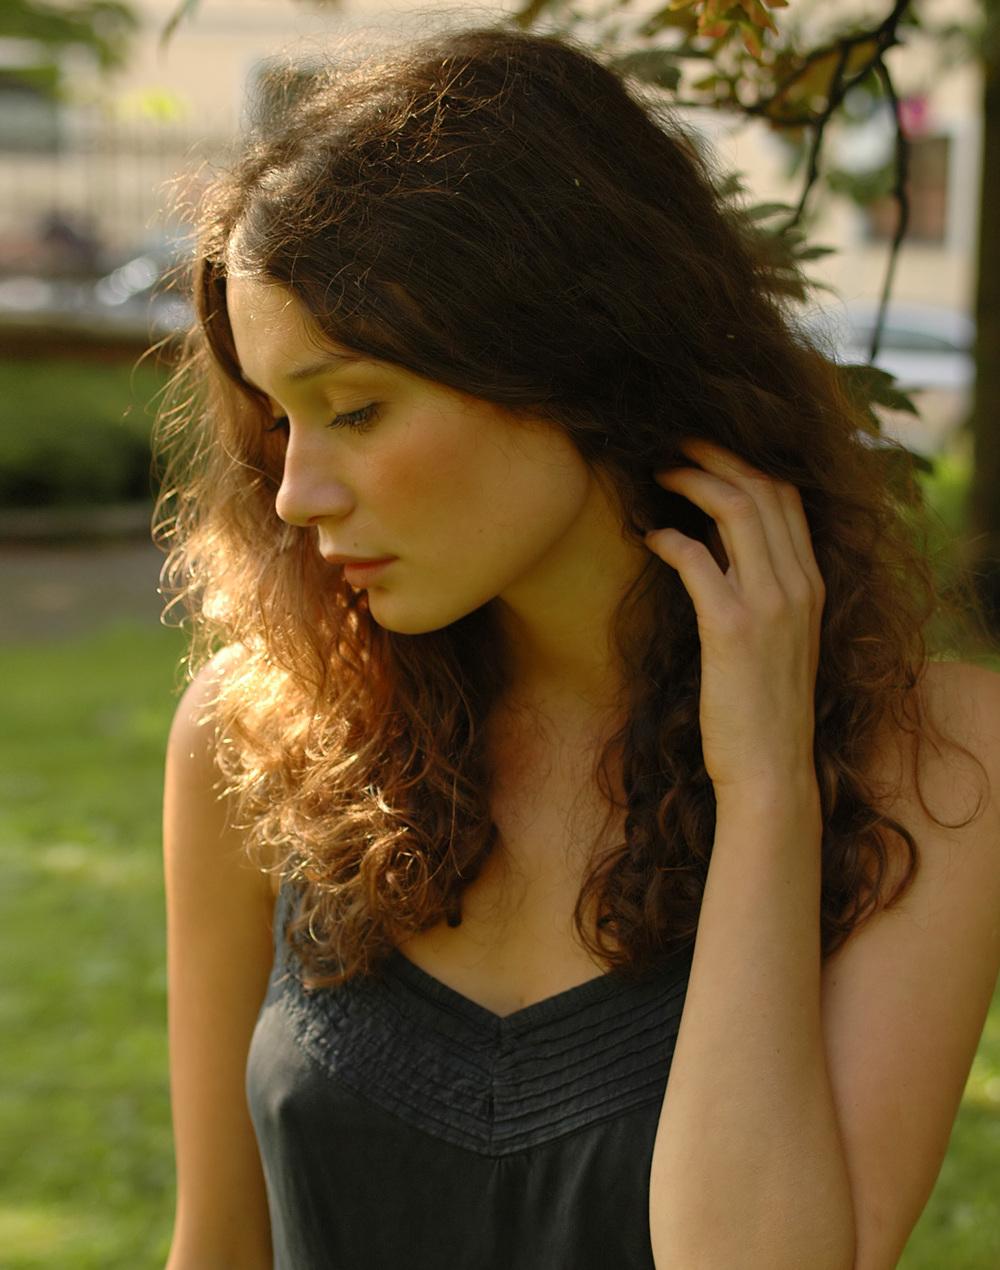 Anja-Carina#.jpg